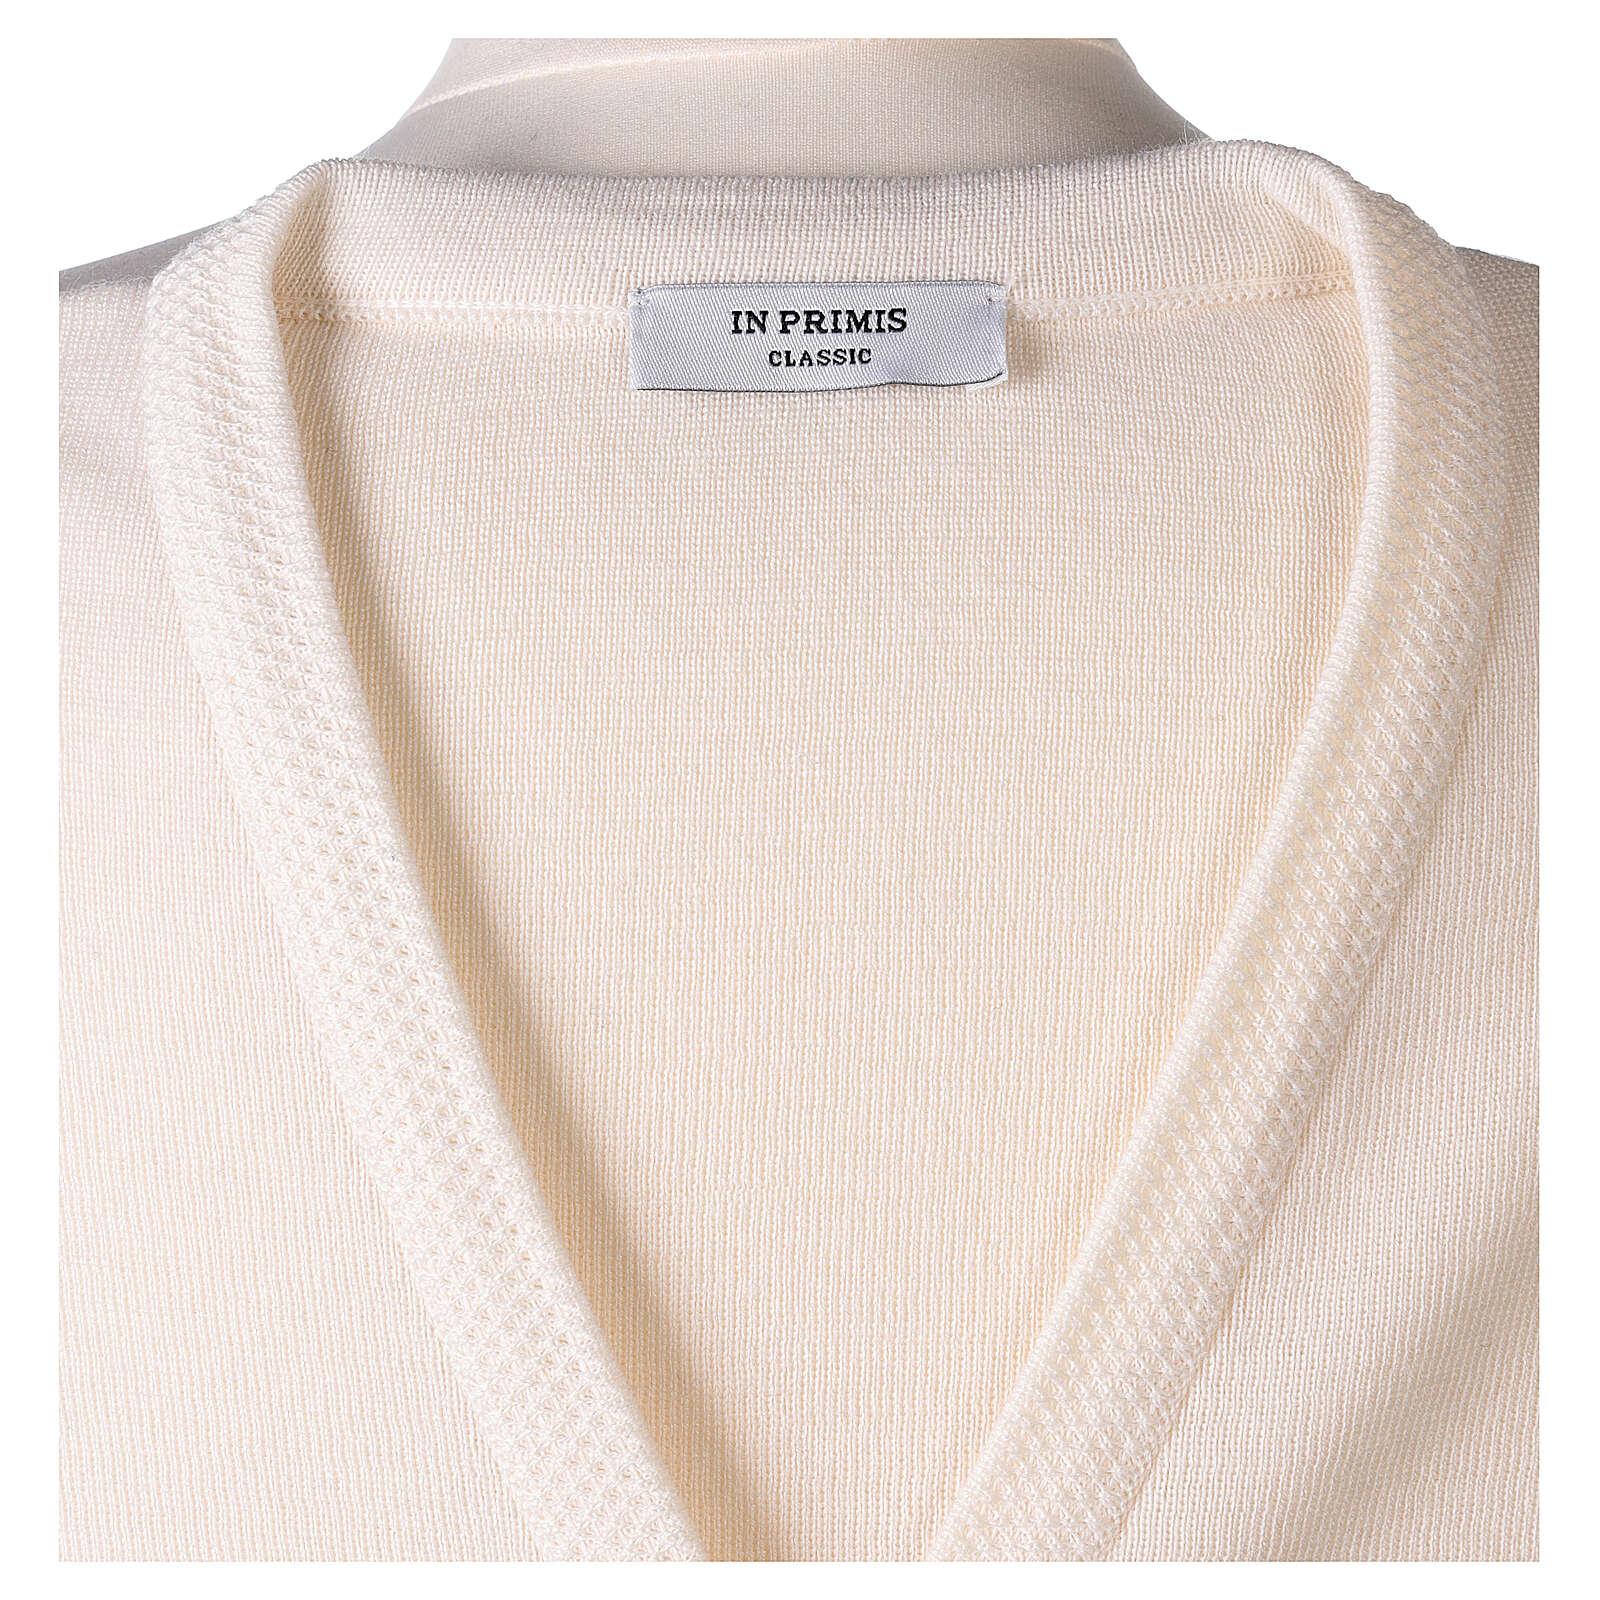 White V-neck nun cardigan with pockets 50% acrylic 50% merino wool In Primis 4